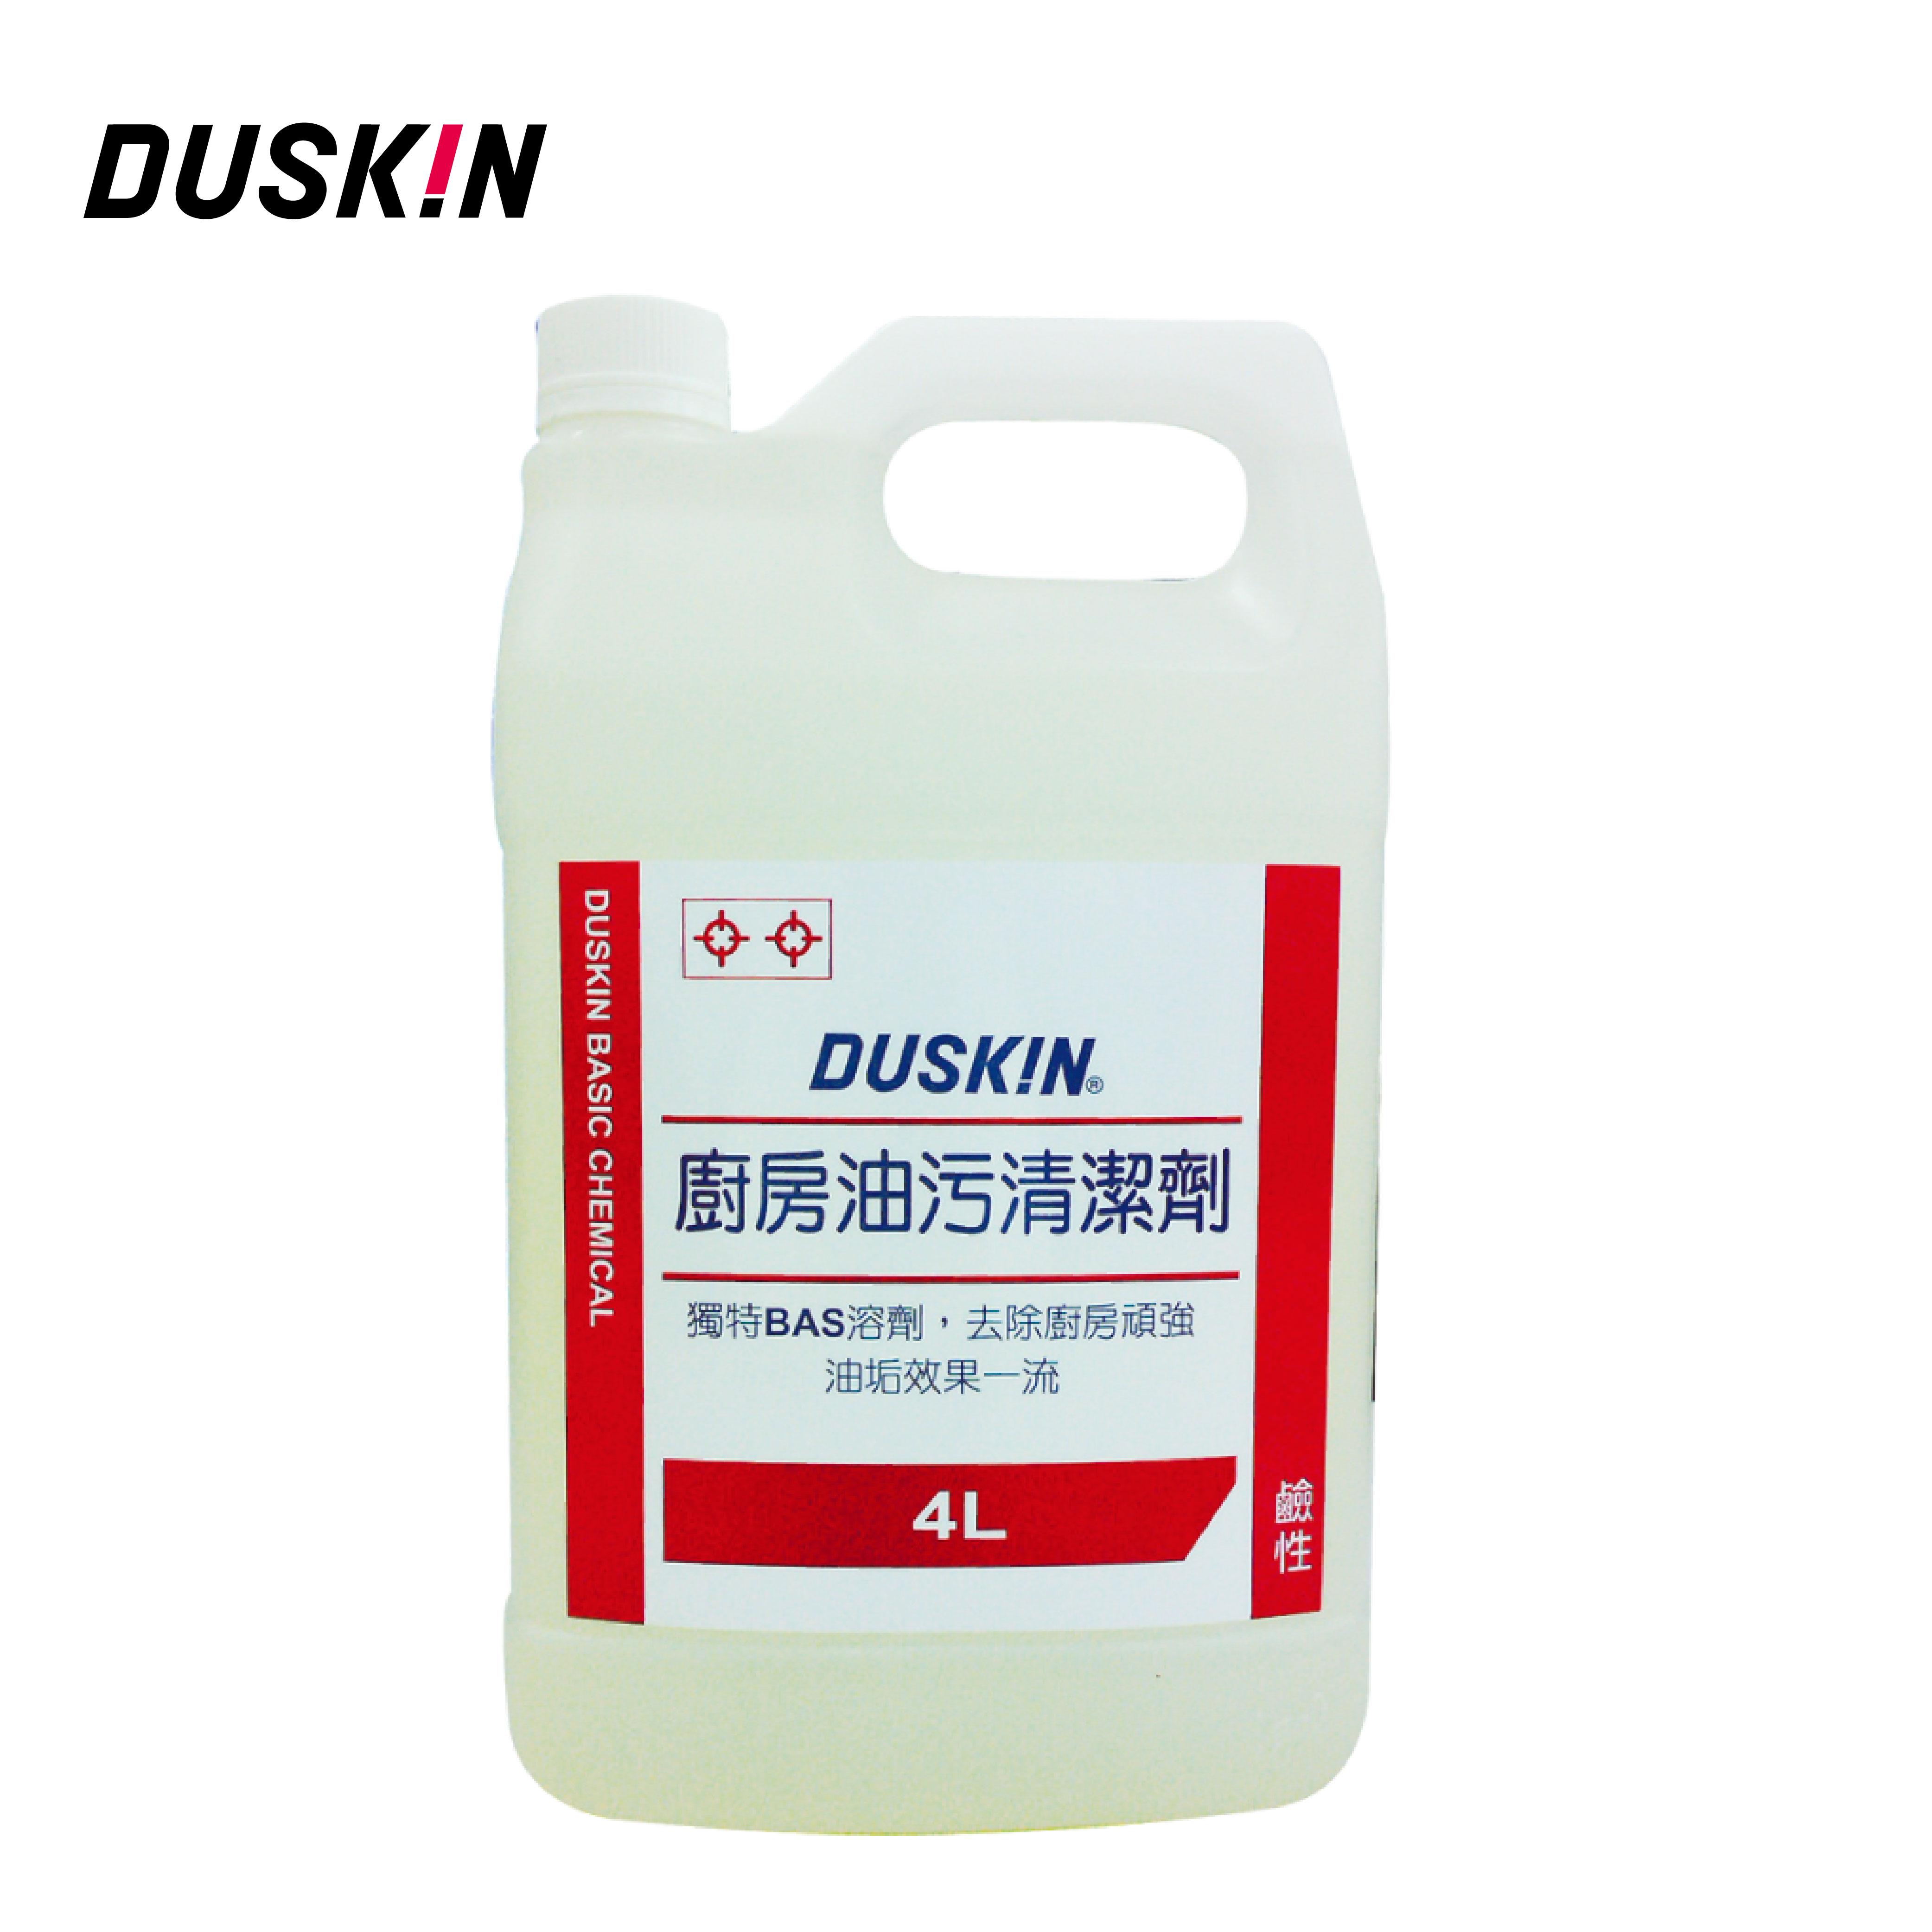 DUSKIN 廚房油污清潔劑(4公升) 大容量 強效溶解瓦斯爐、抽風機、磁磚周圍厚重的油污 - 限時優惠好康折扣